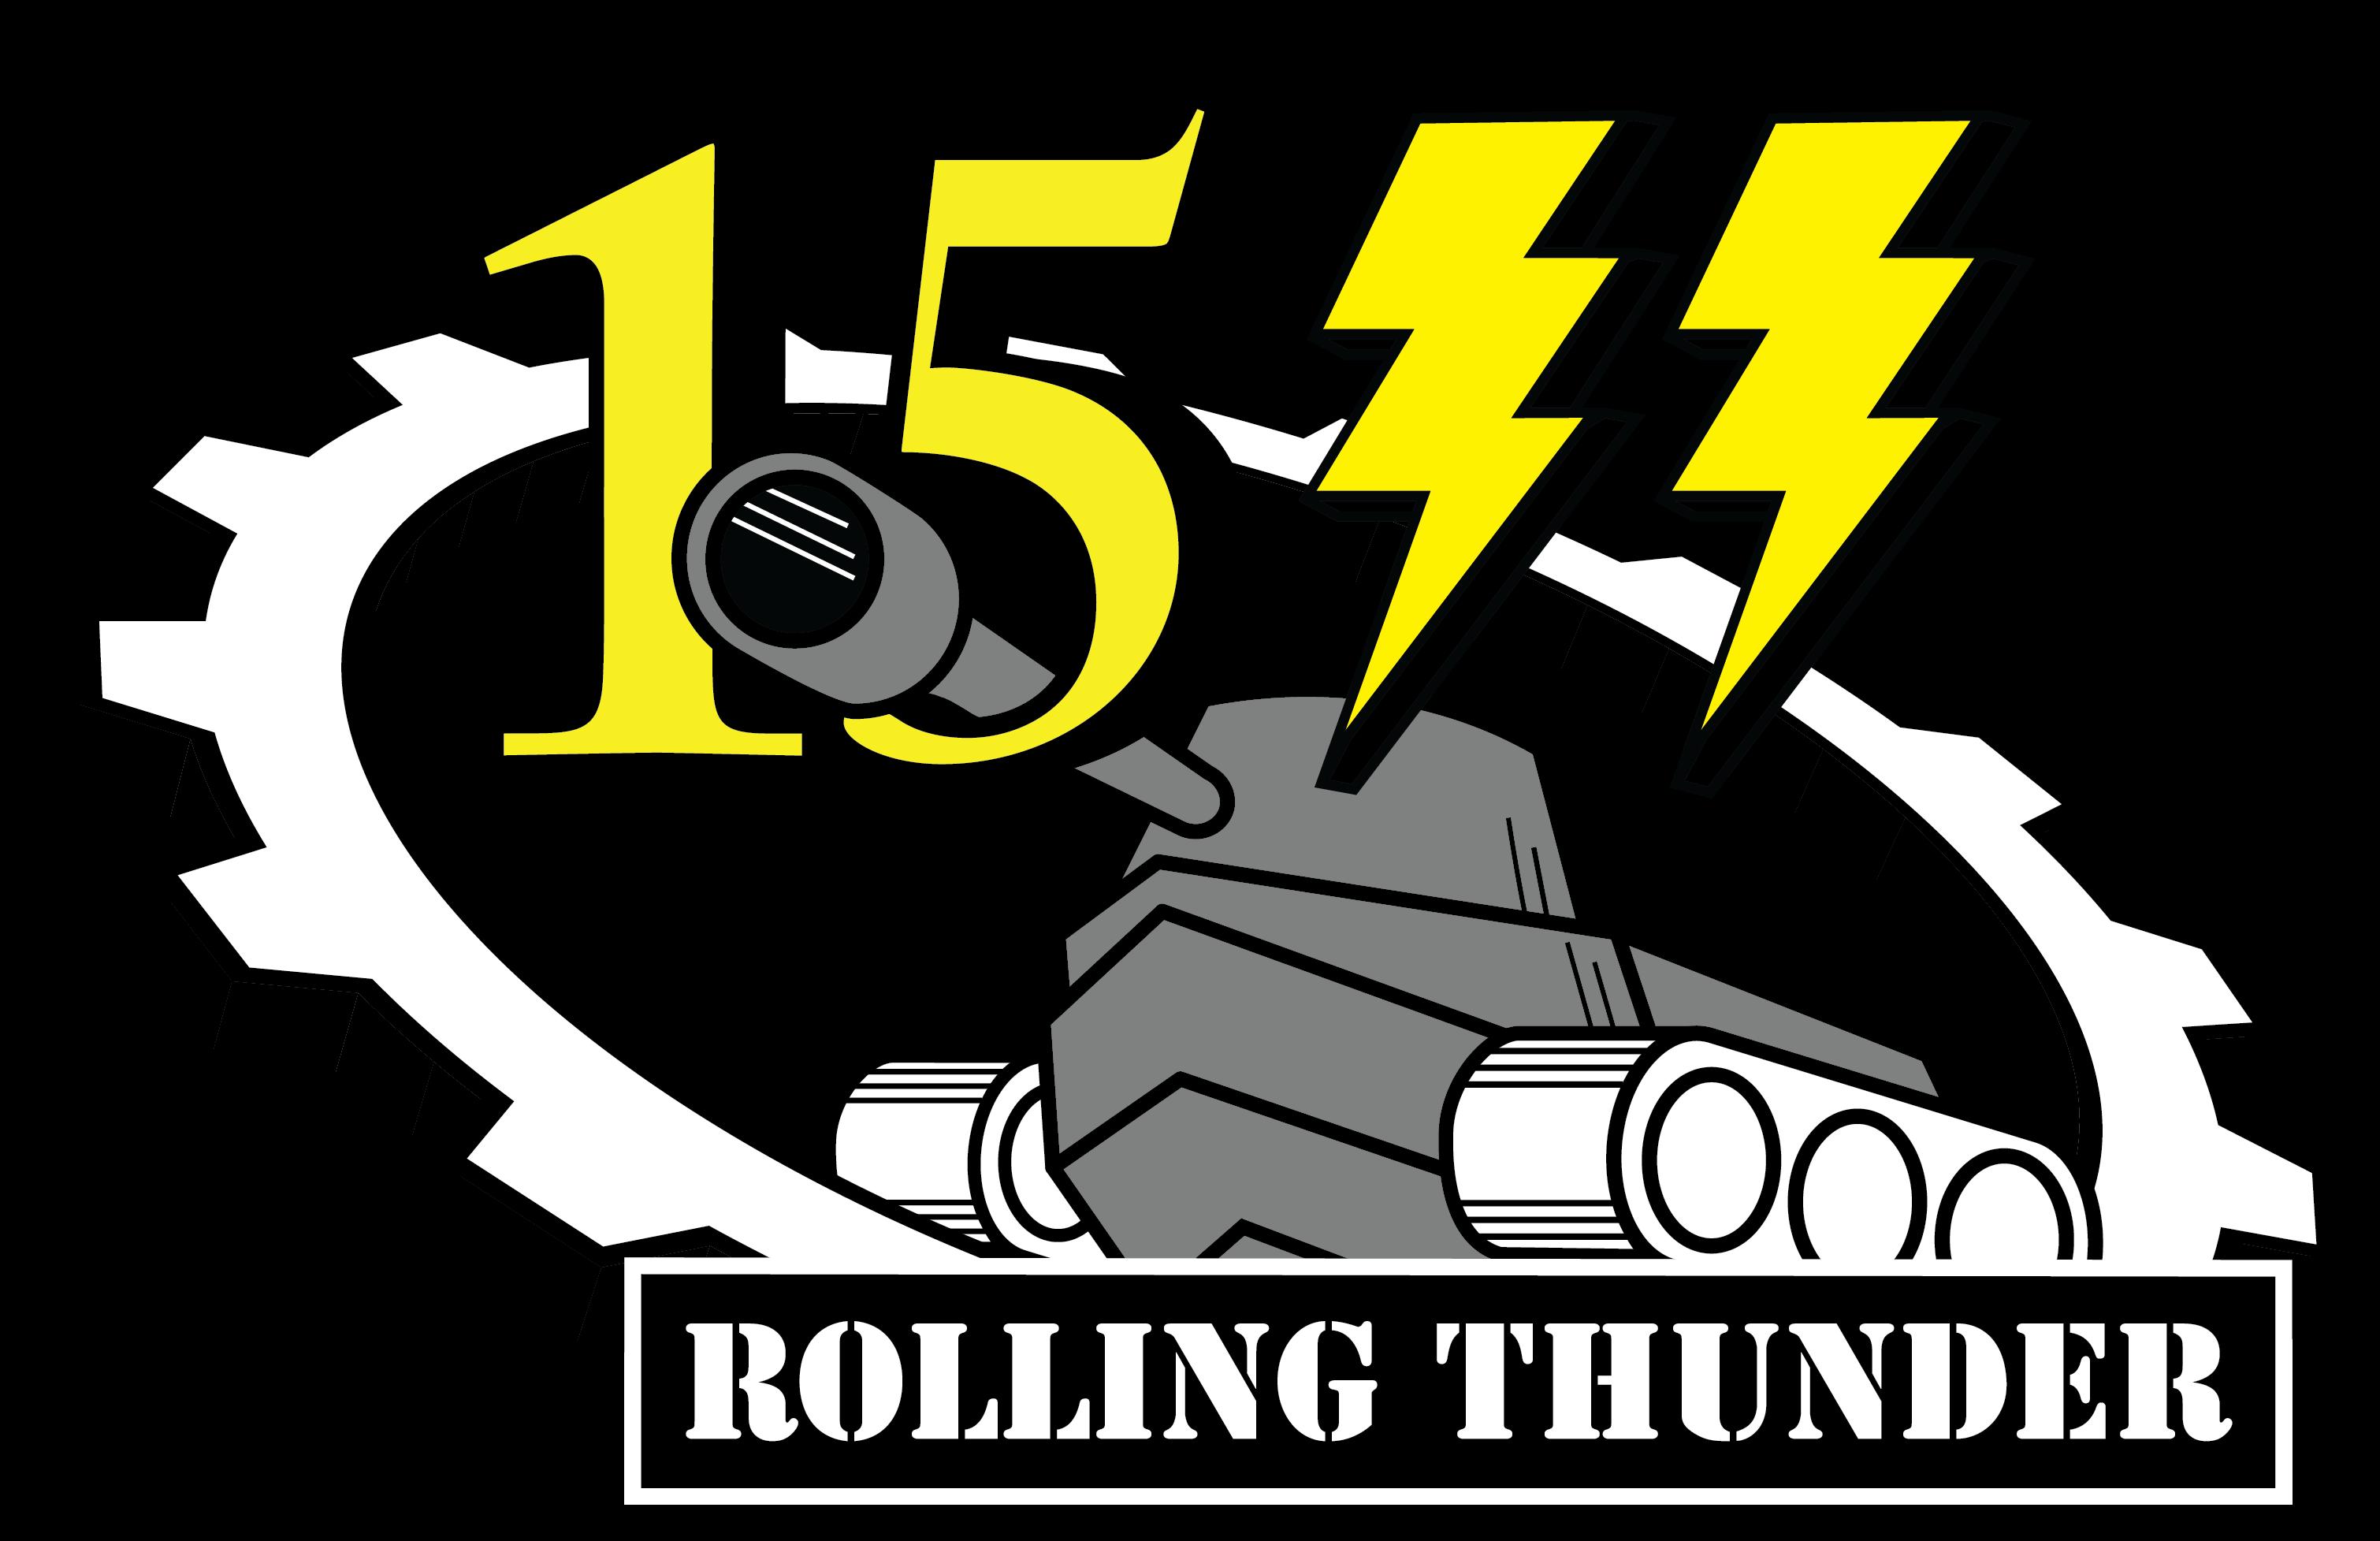 FRC 1511 Rolling Thunder